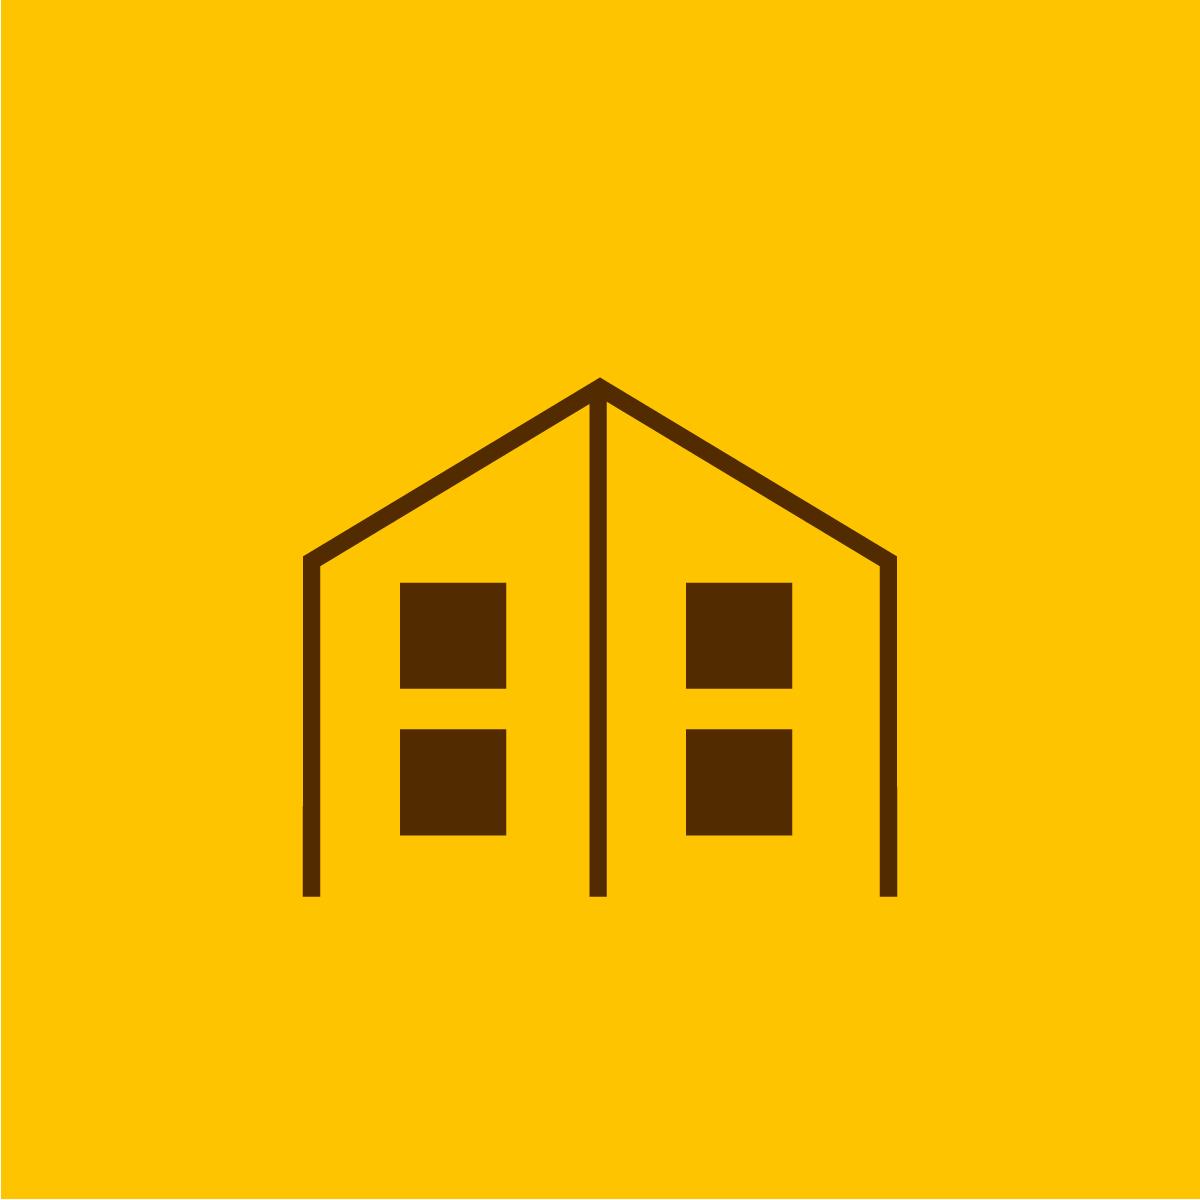 Haustyp Doppelhaus